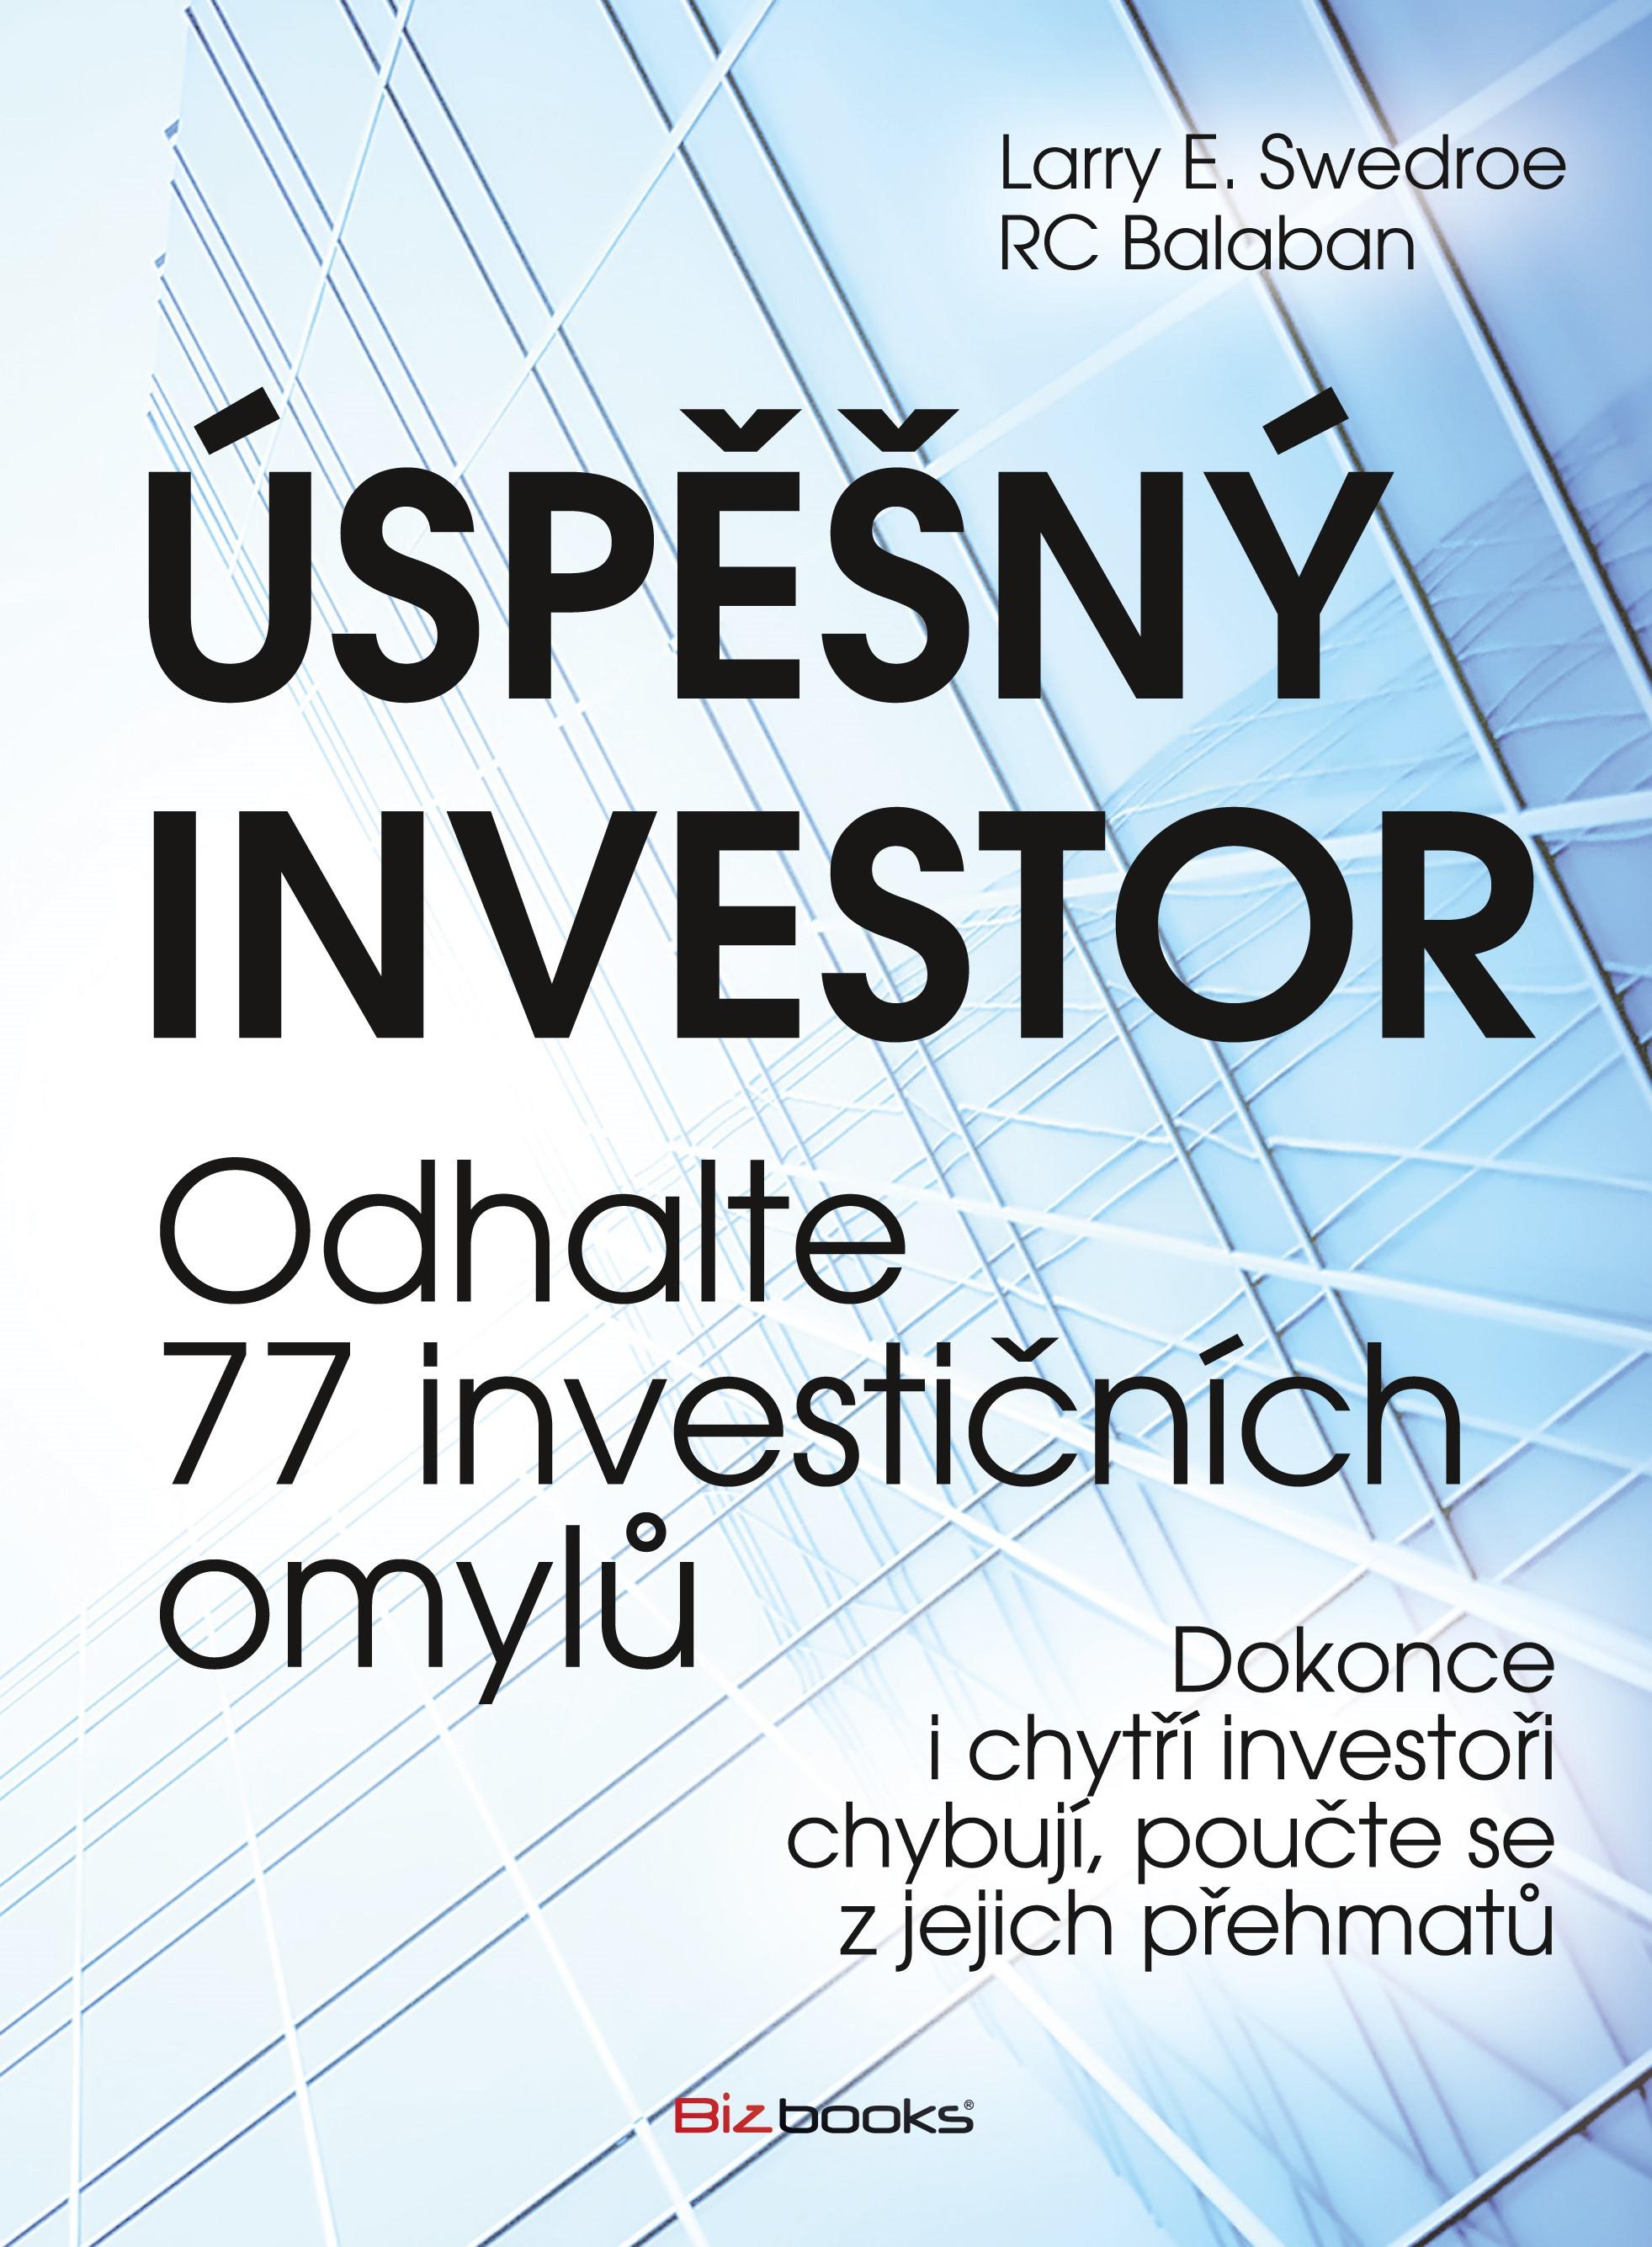 Úspěšný investor | RC Balaban, Larry E. Swedroe